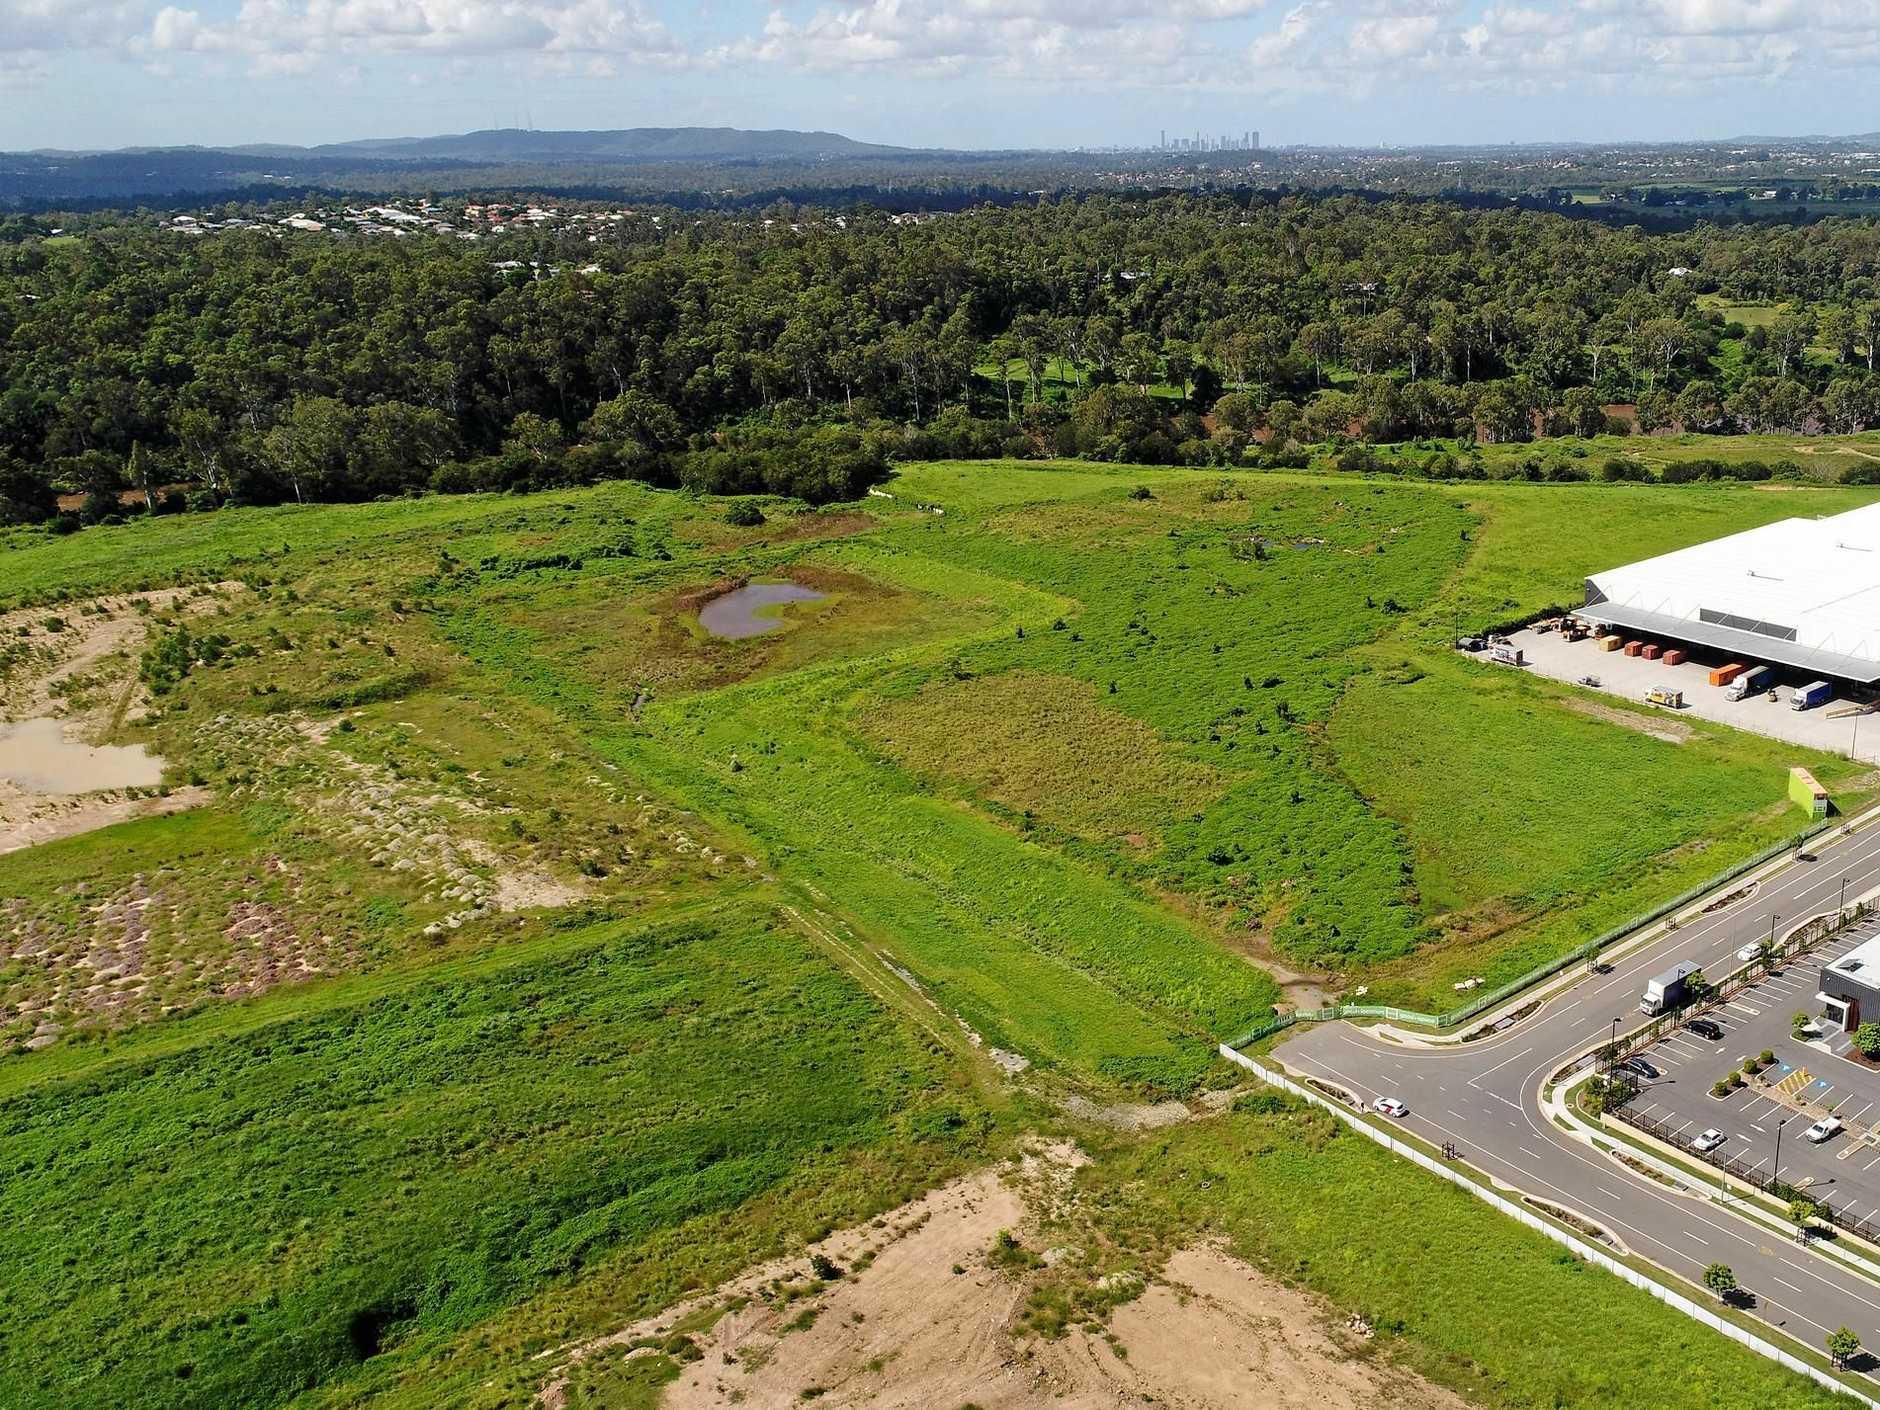 Aerial view of the Redbank Rheinmetall site.